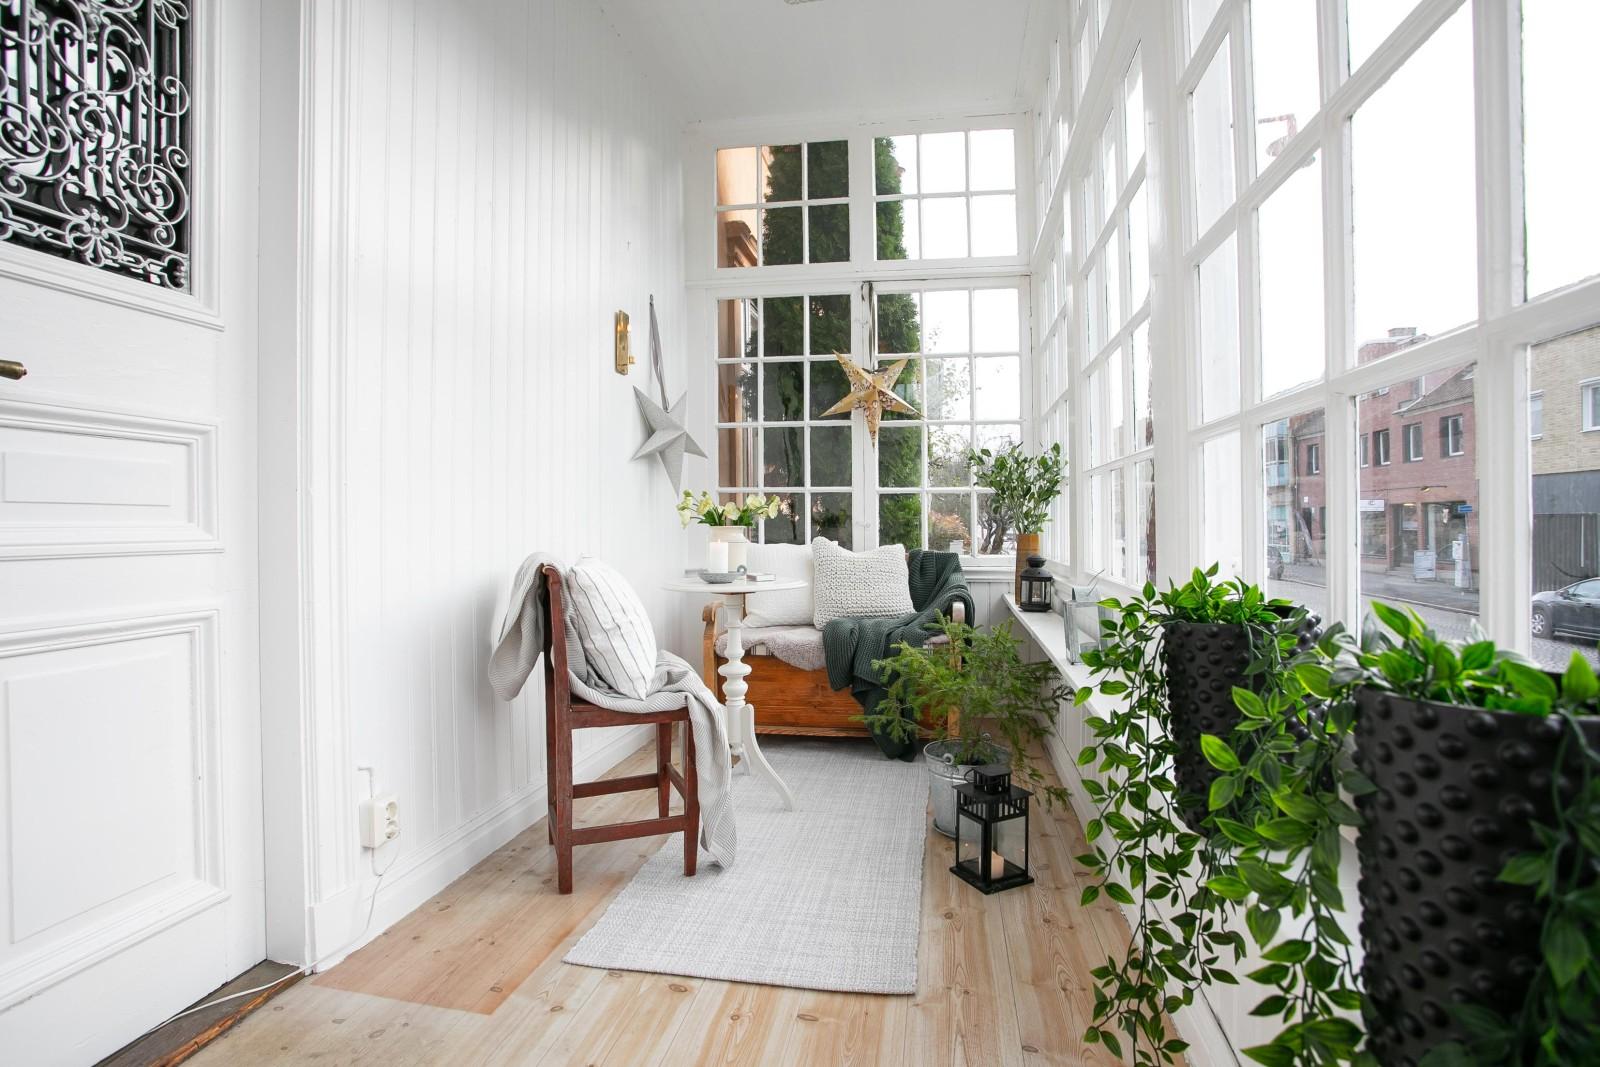 Inglasad veranda..